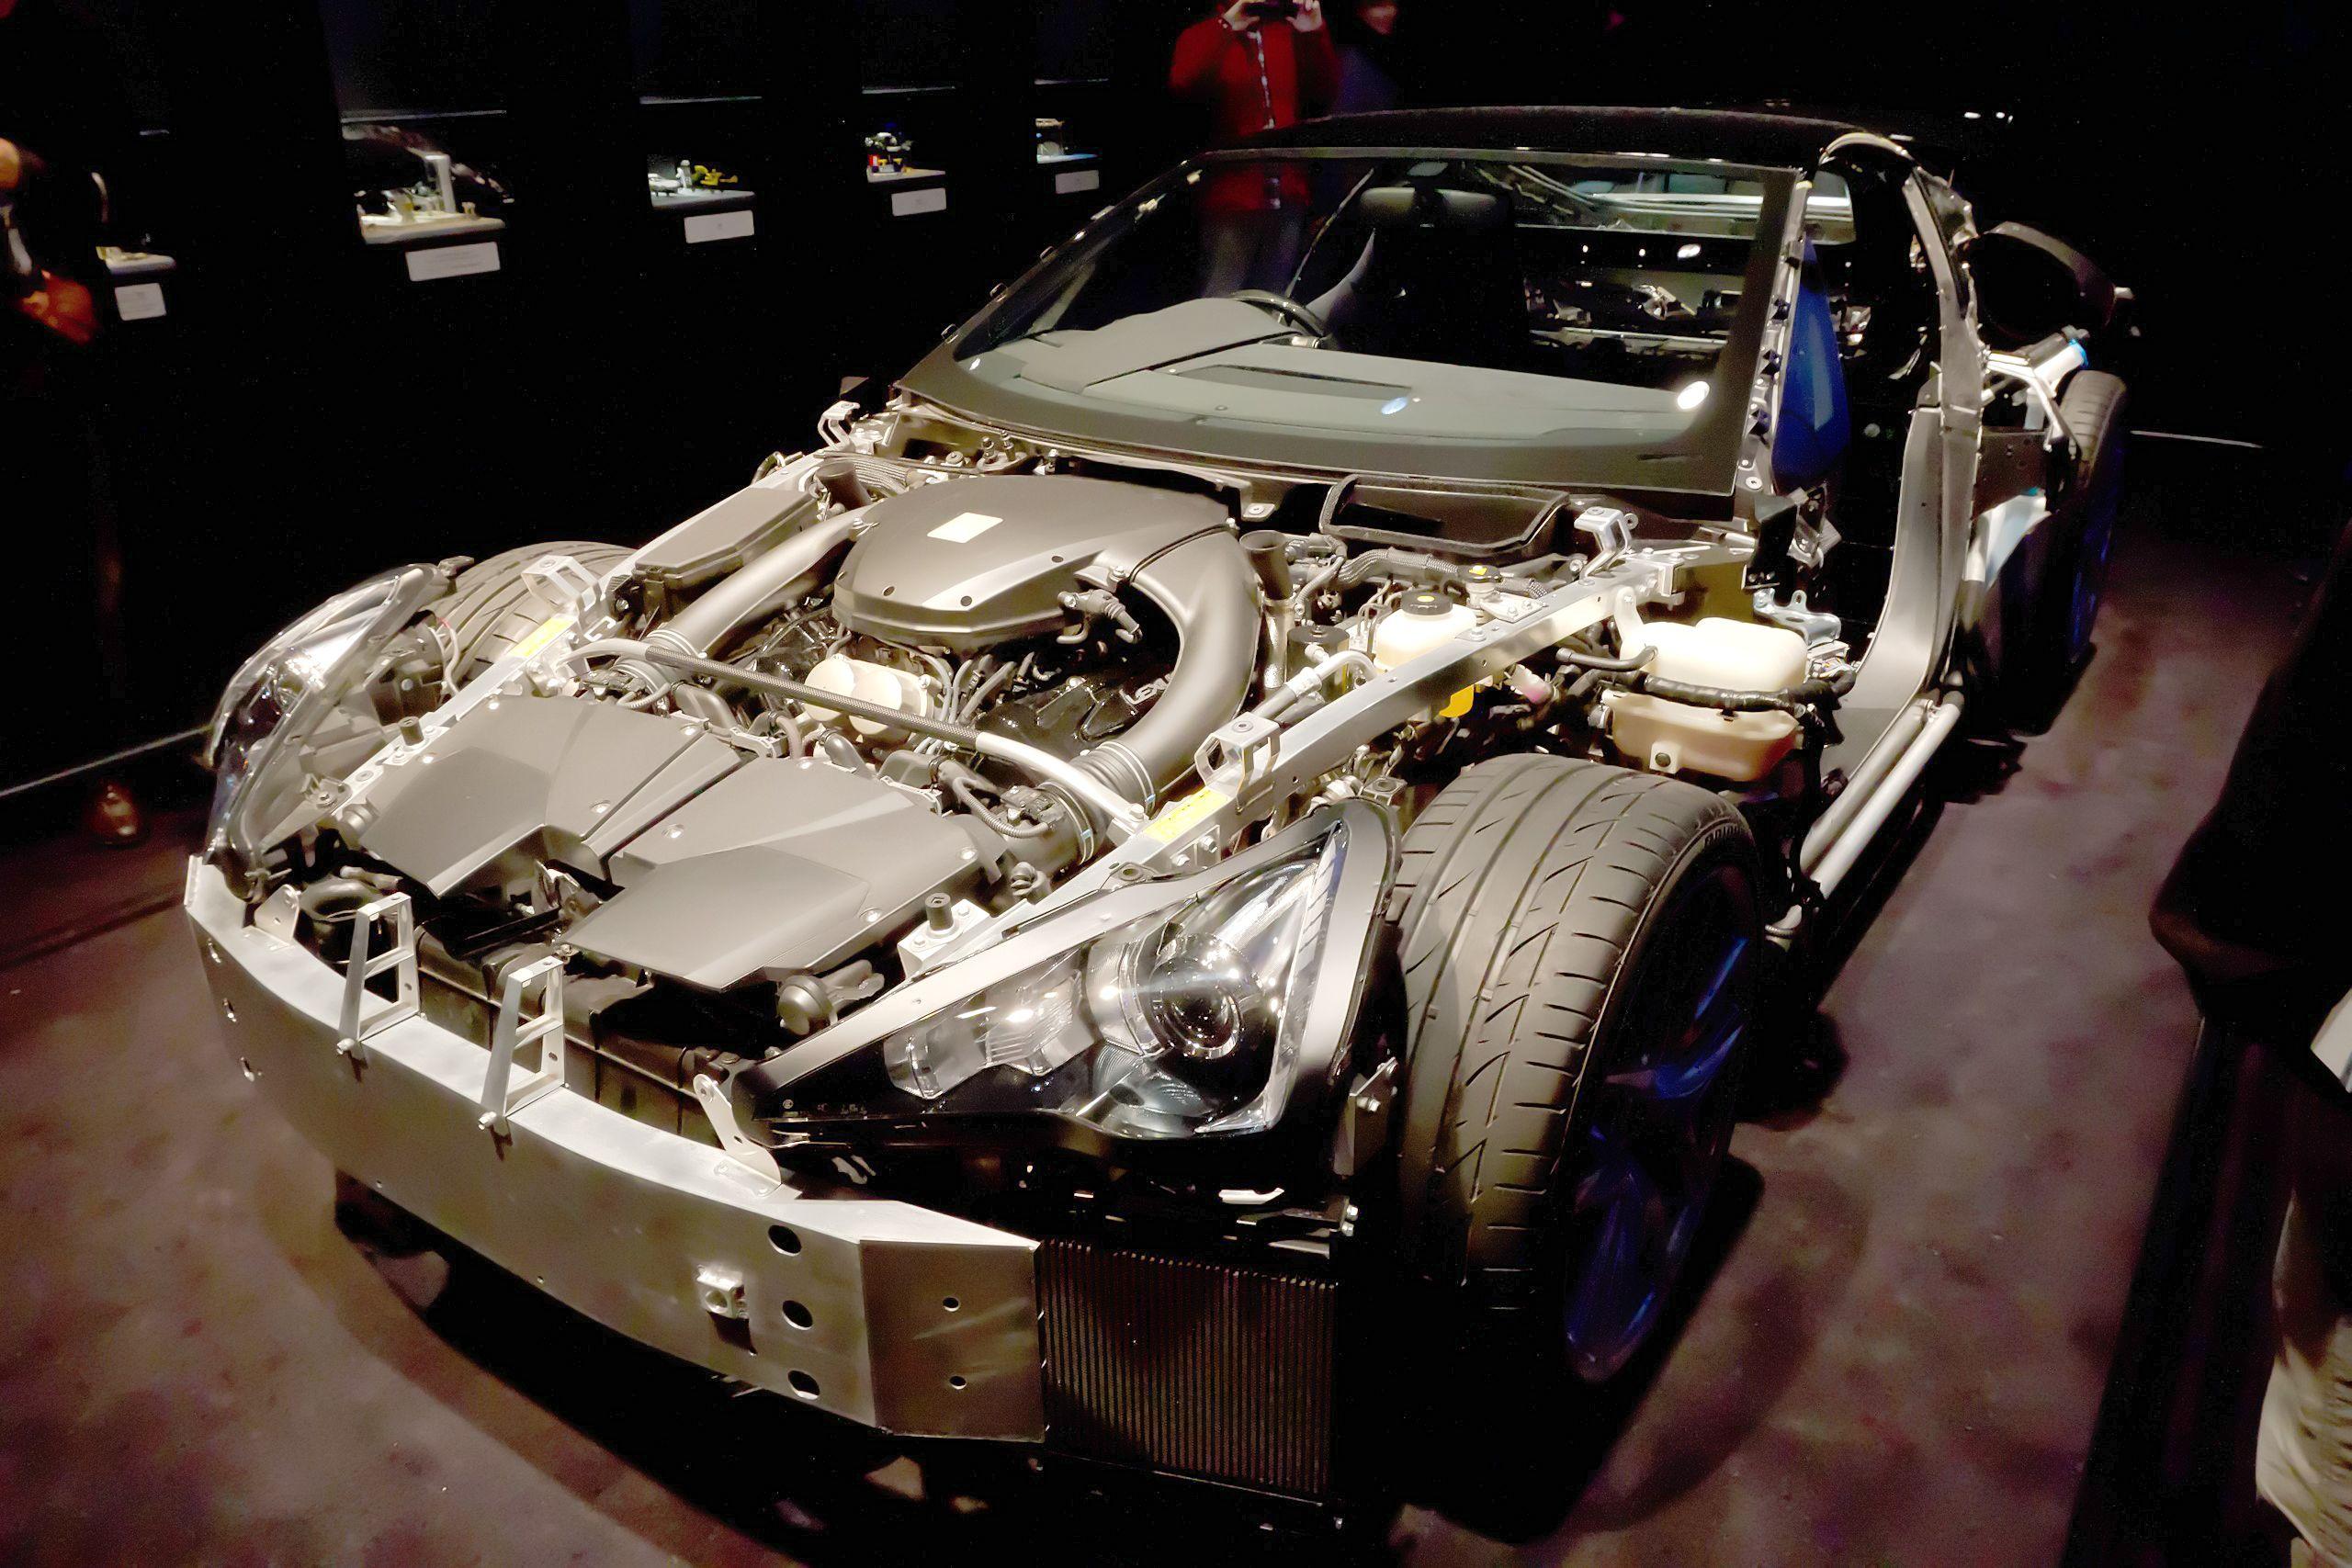 medium resolution of lfa lexus lfa tokyo motor show mechanical design car brands custom motorcycles